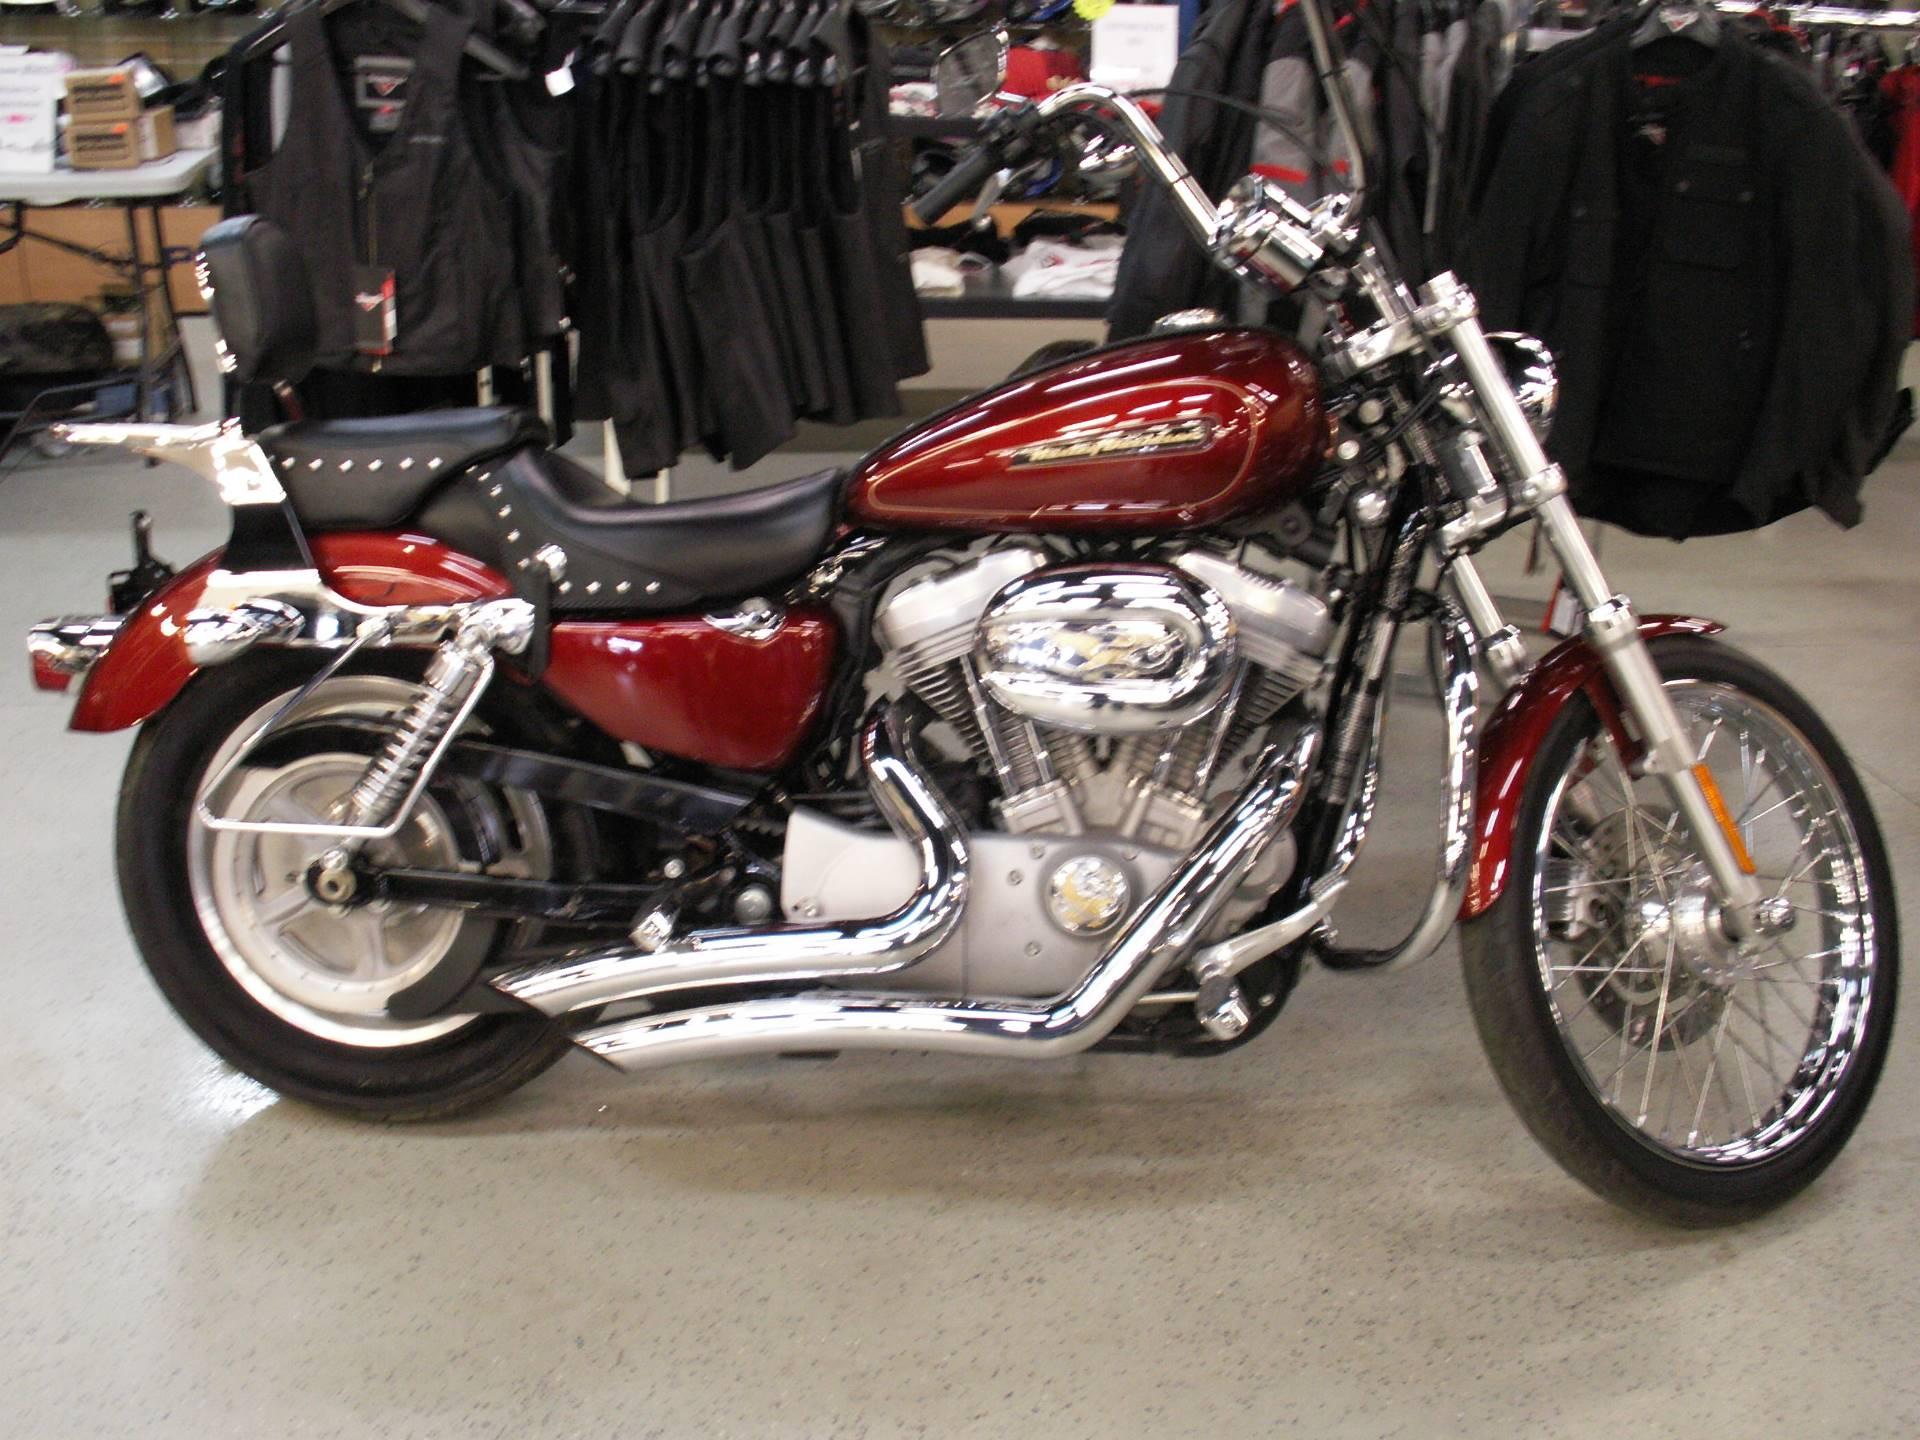 2009 Harley-Davidson Sportster 883 Custom 3